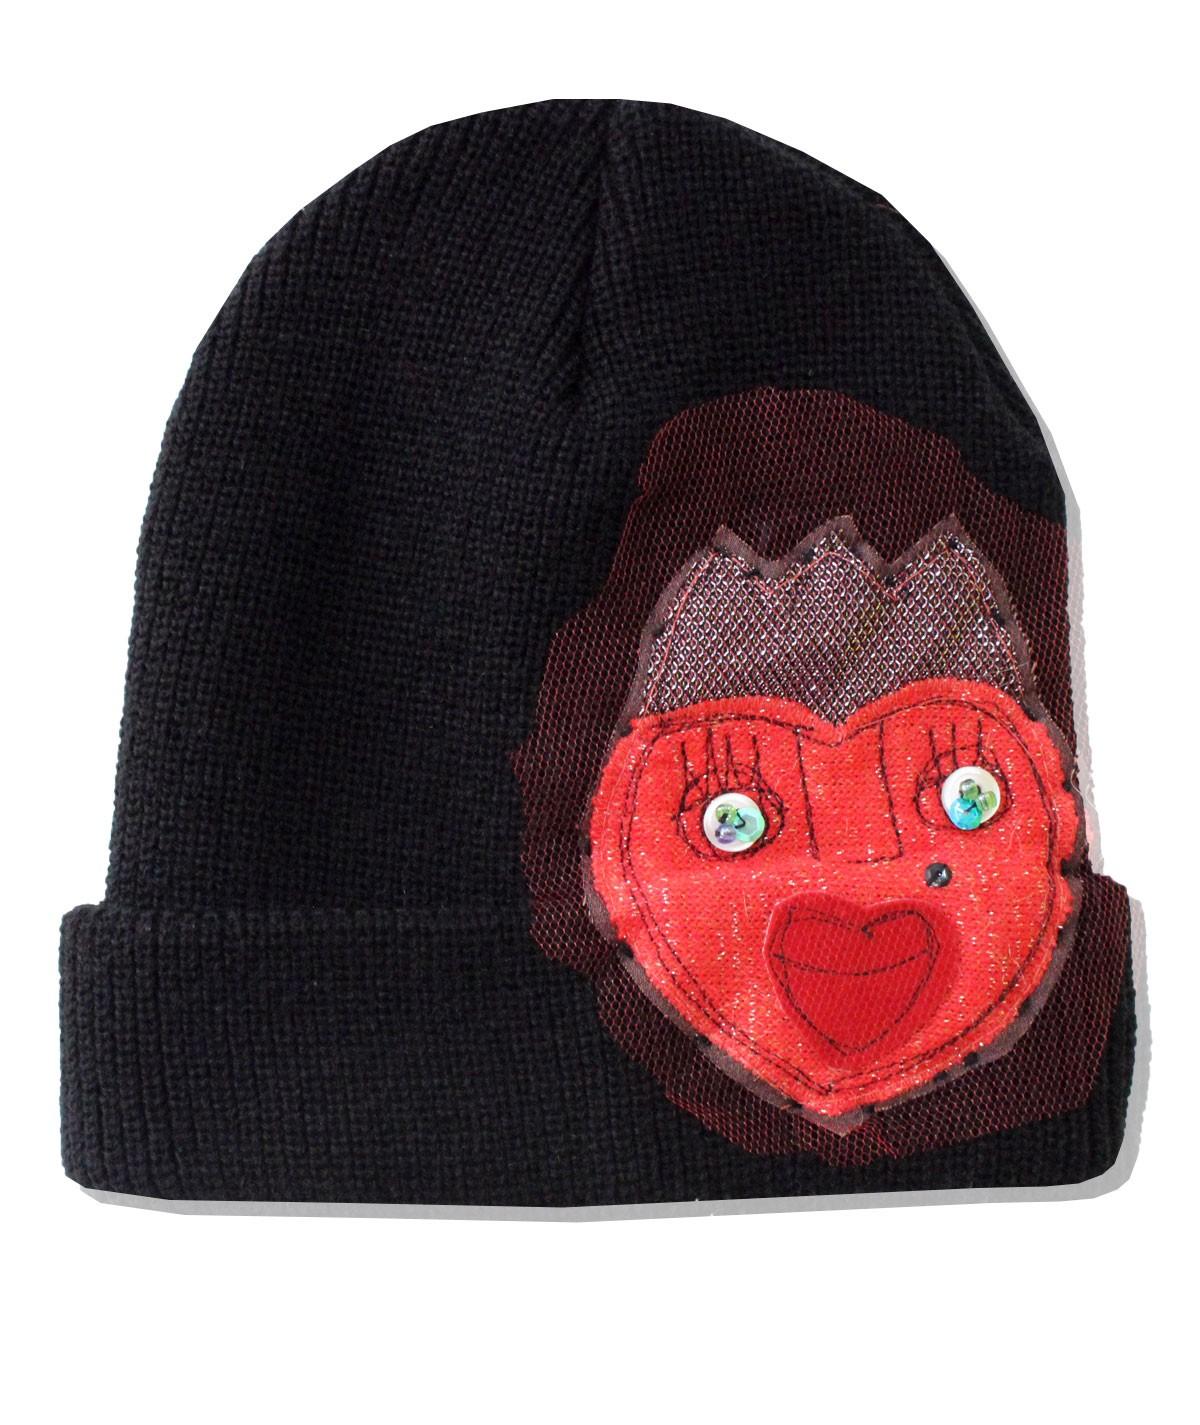 Love - hat